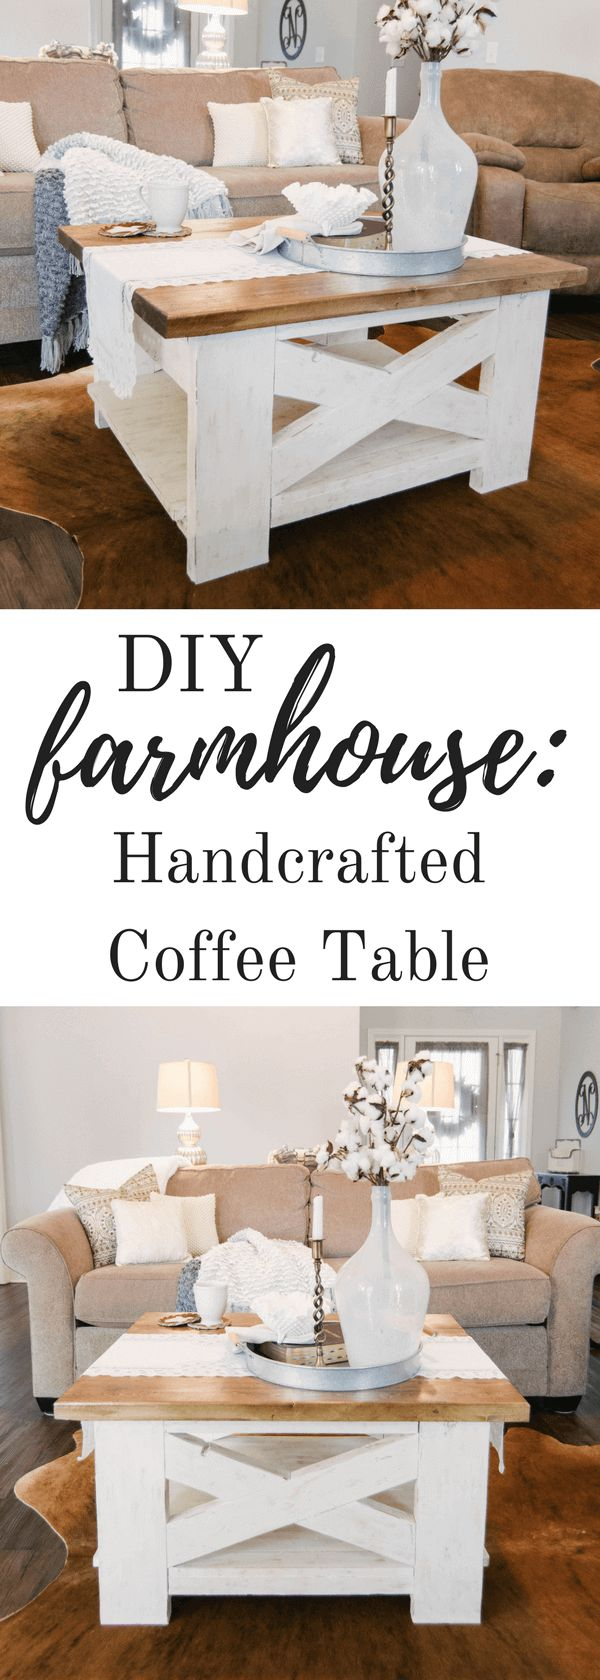 Handcrafted Farmhouse Coffee Table #diy #farmhousestyle